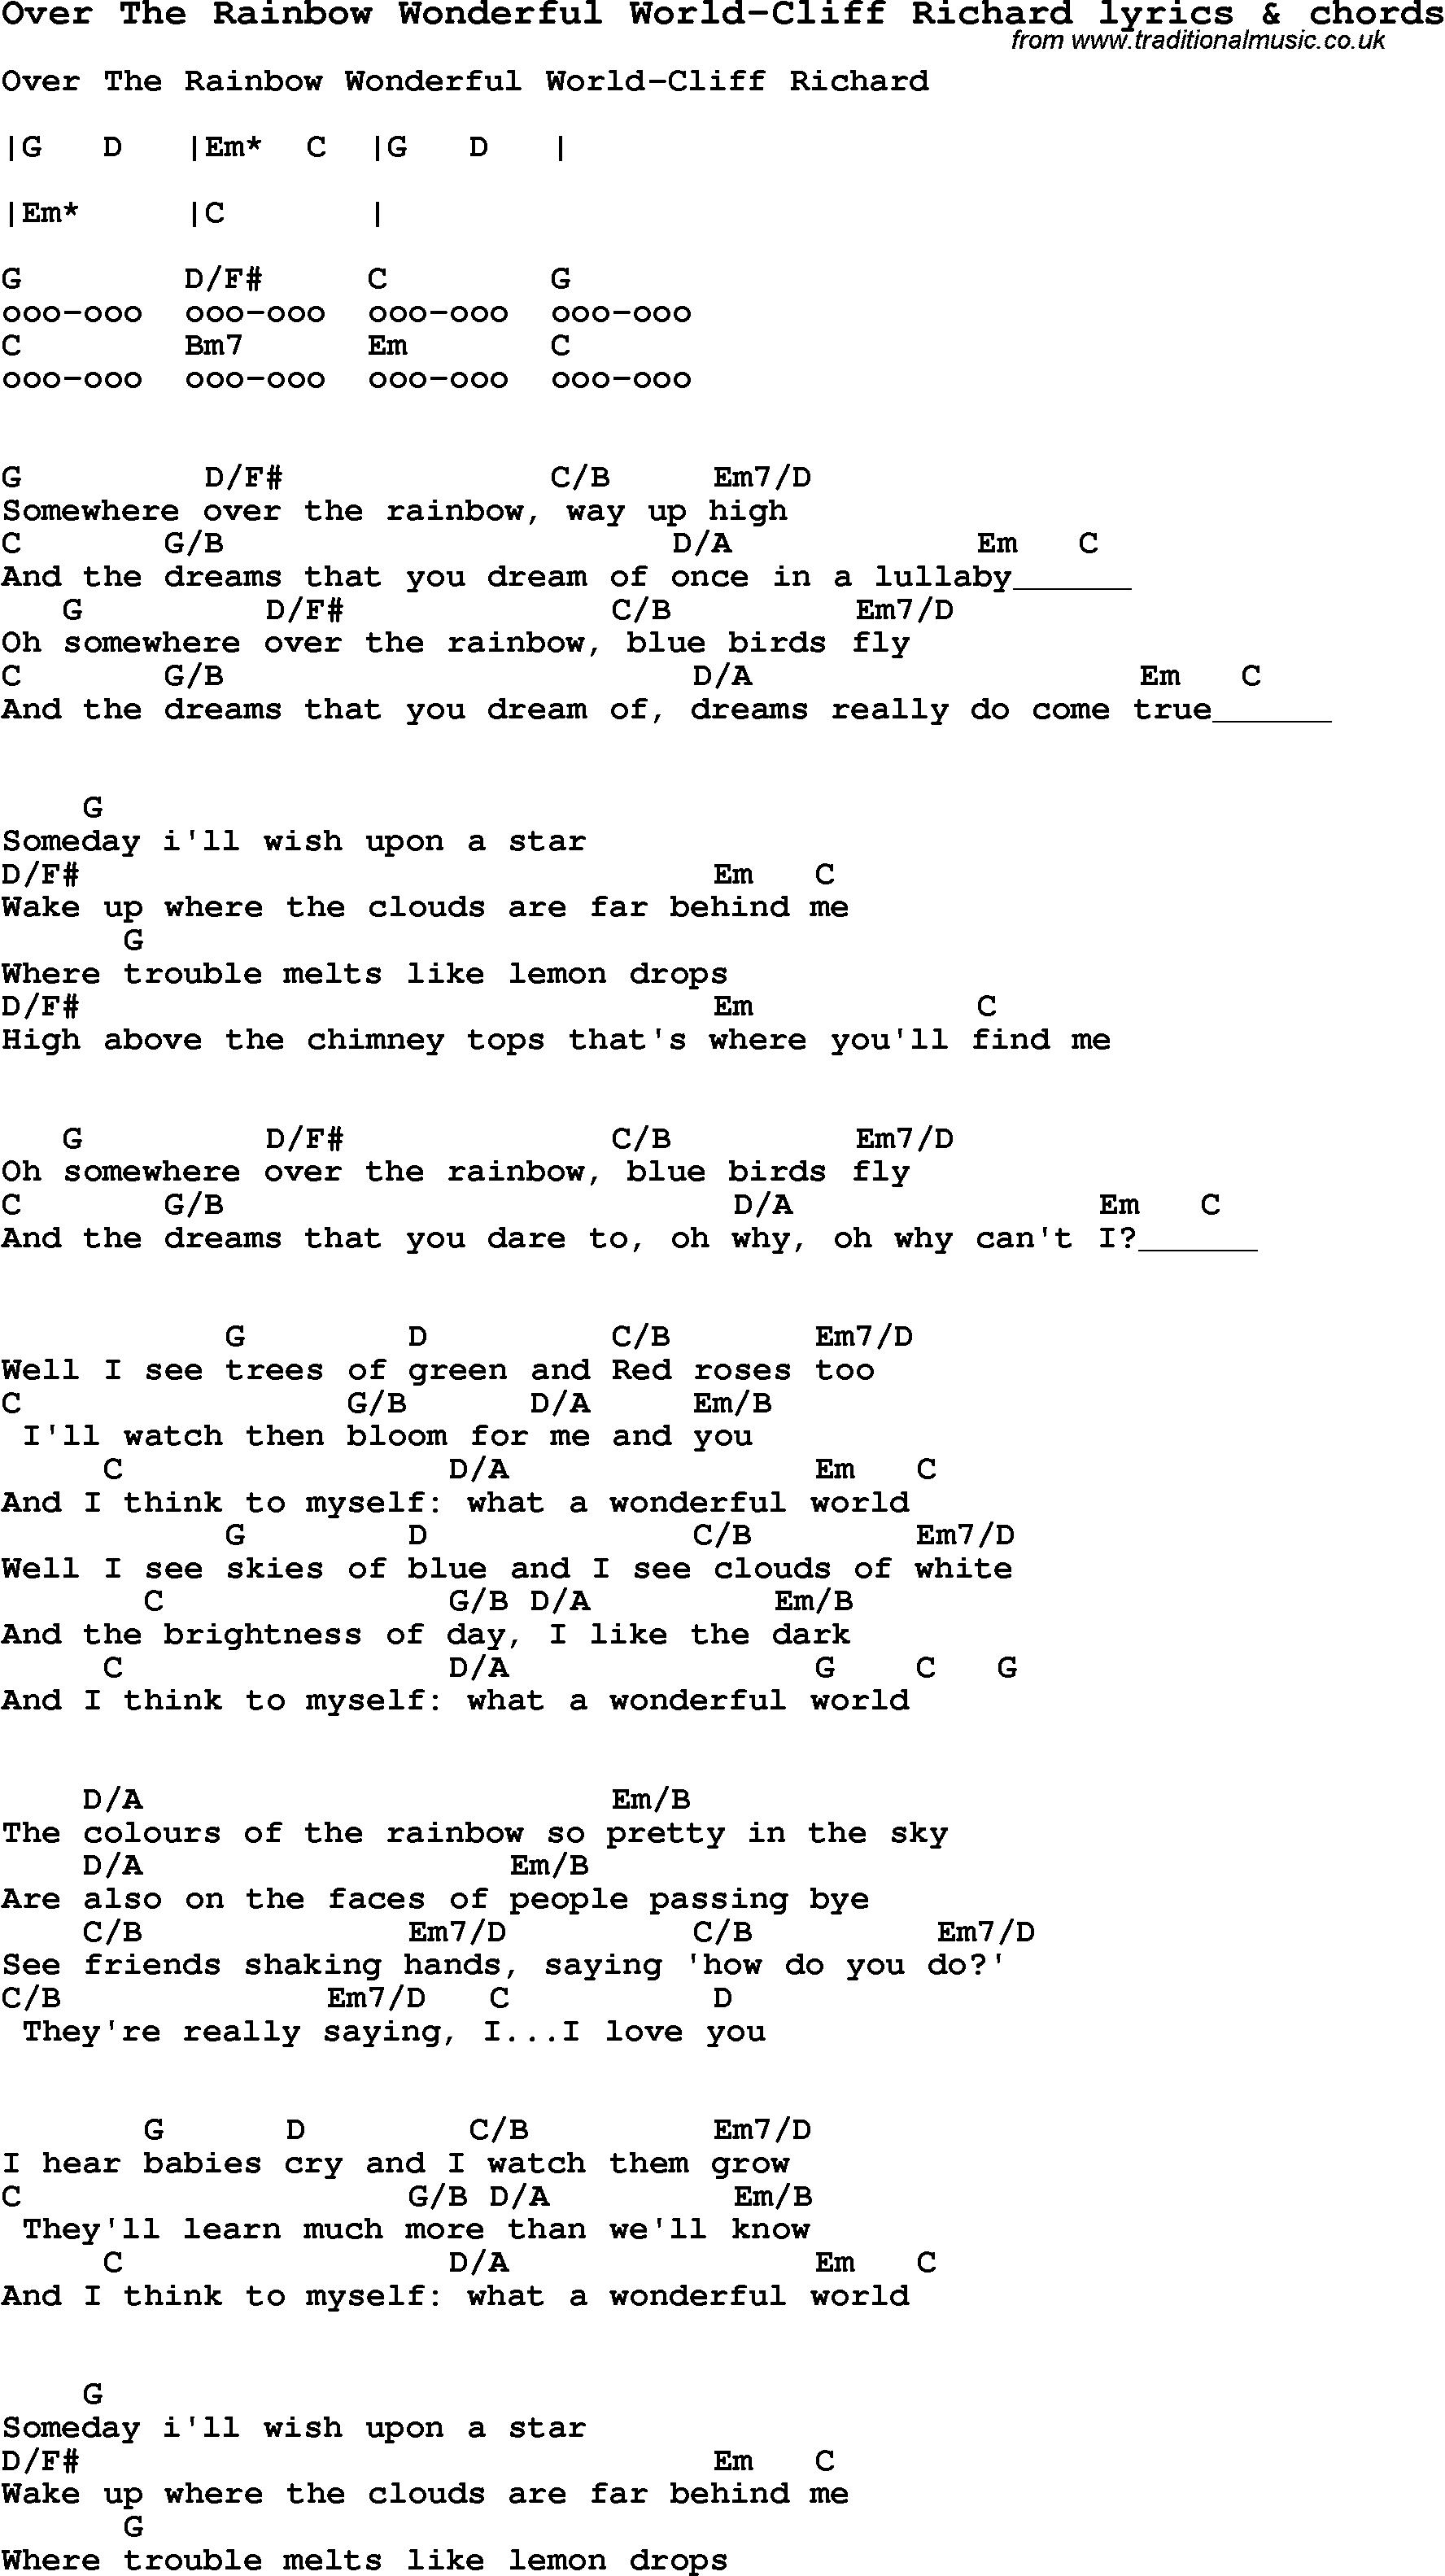 What A Wonderful World Chords Love Song Lyrics Forover The Rainbow Wonderful World Cliff Richard